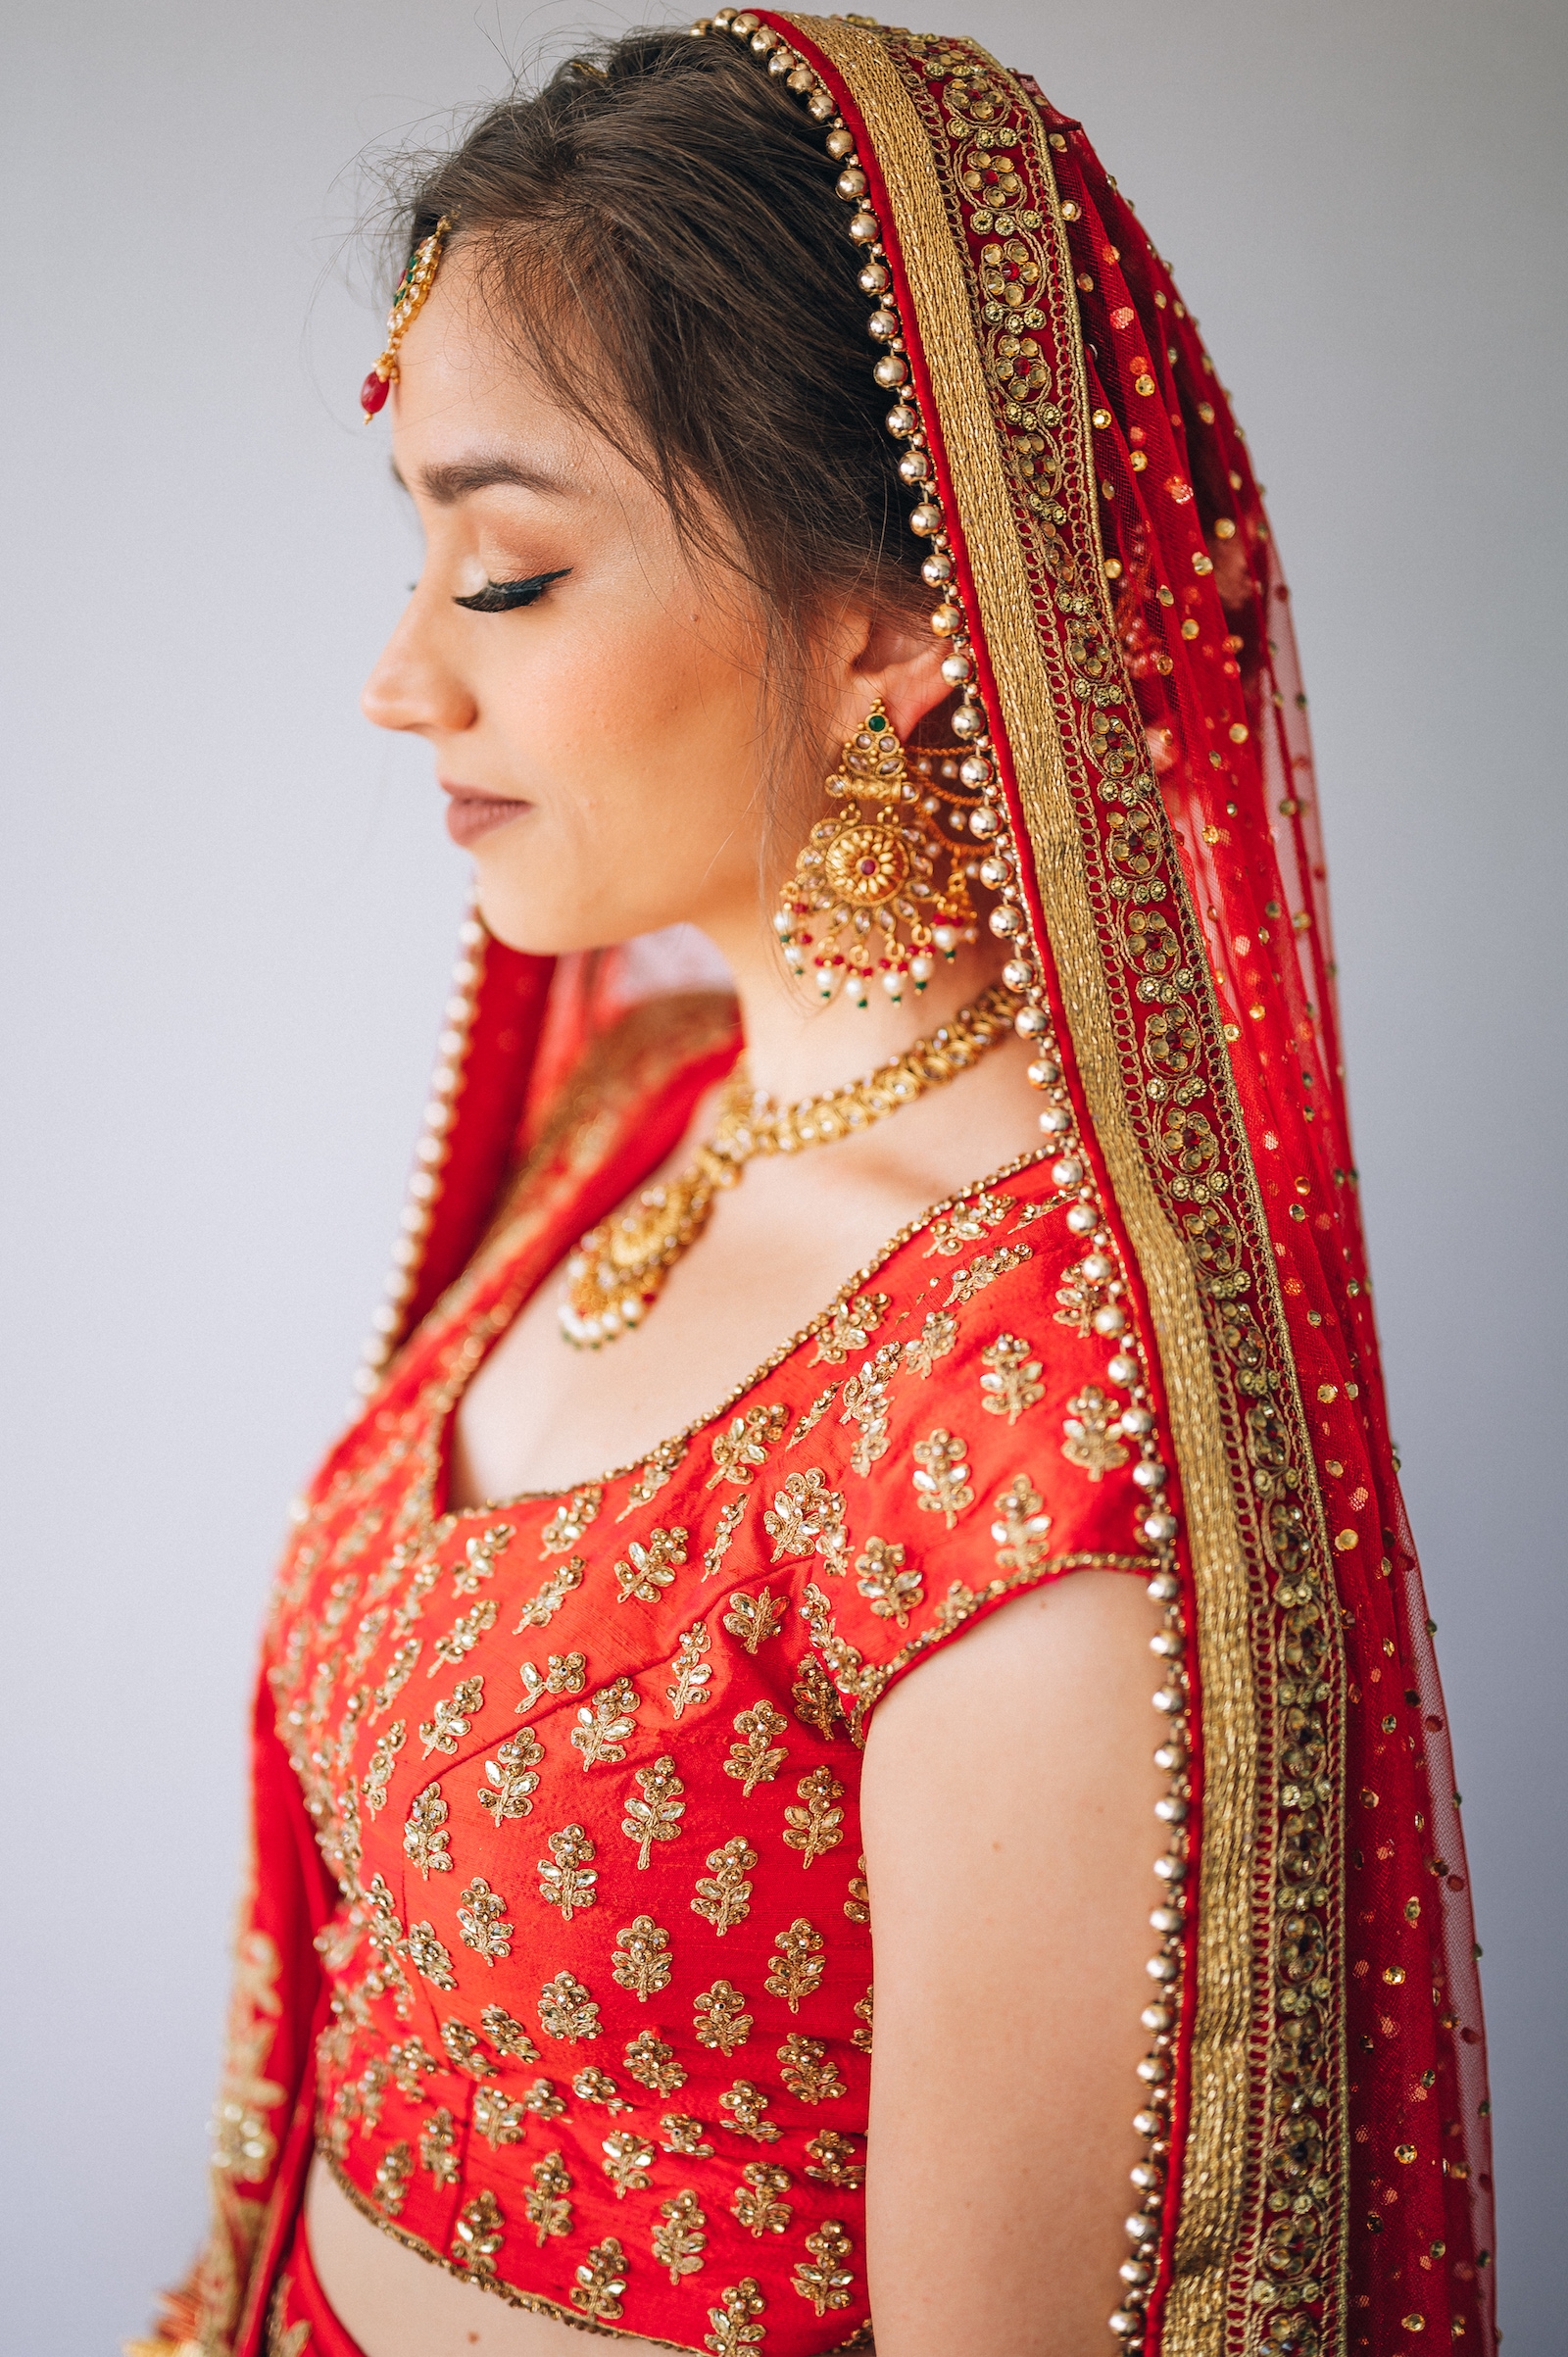 Bridal portrait: Charming Indian Wedding featured on NBG blog!